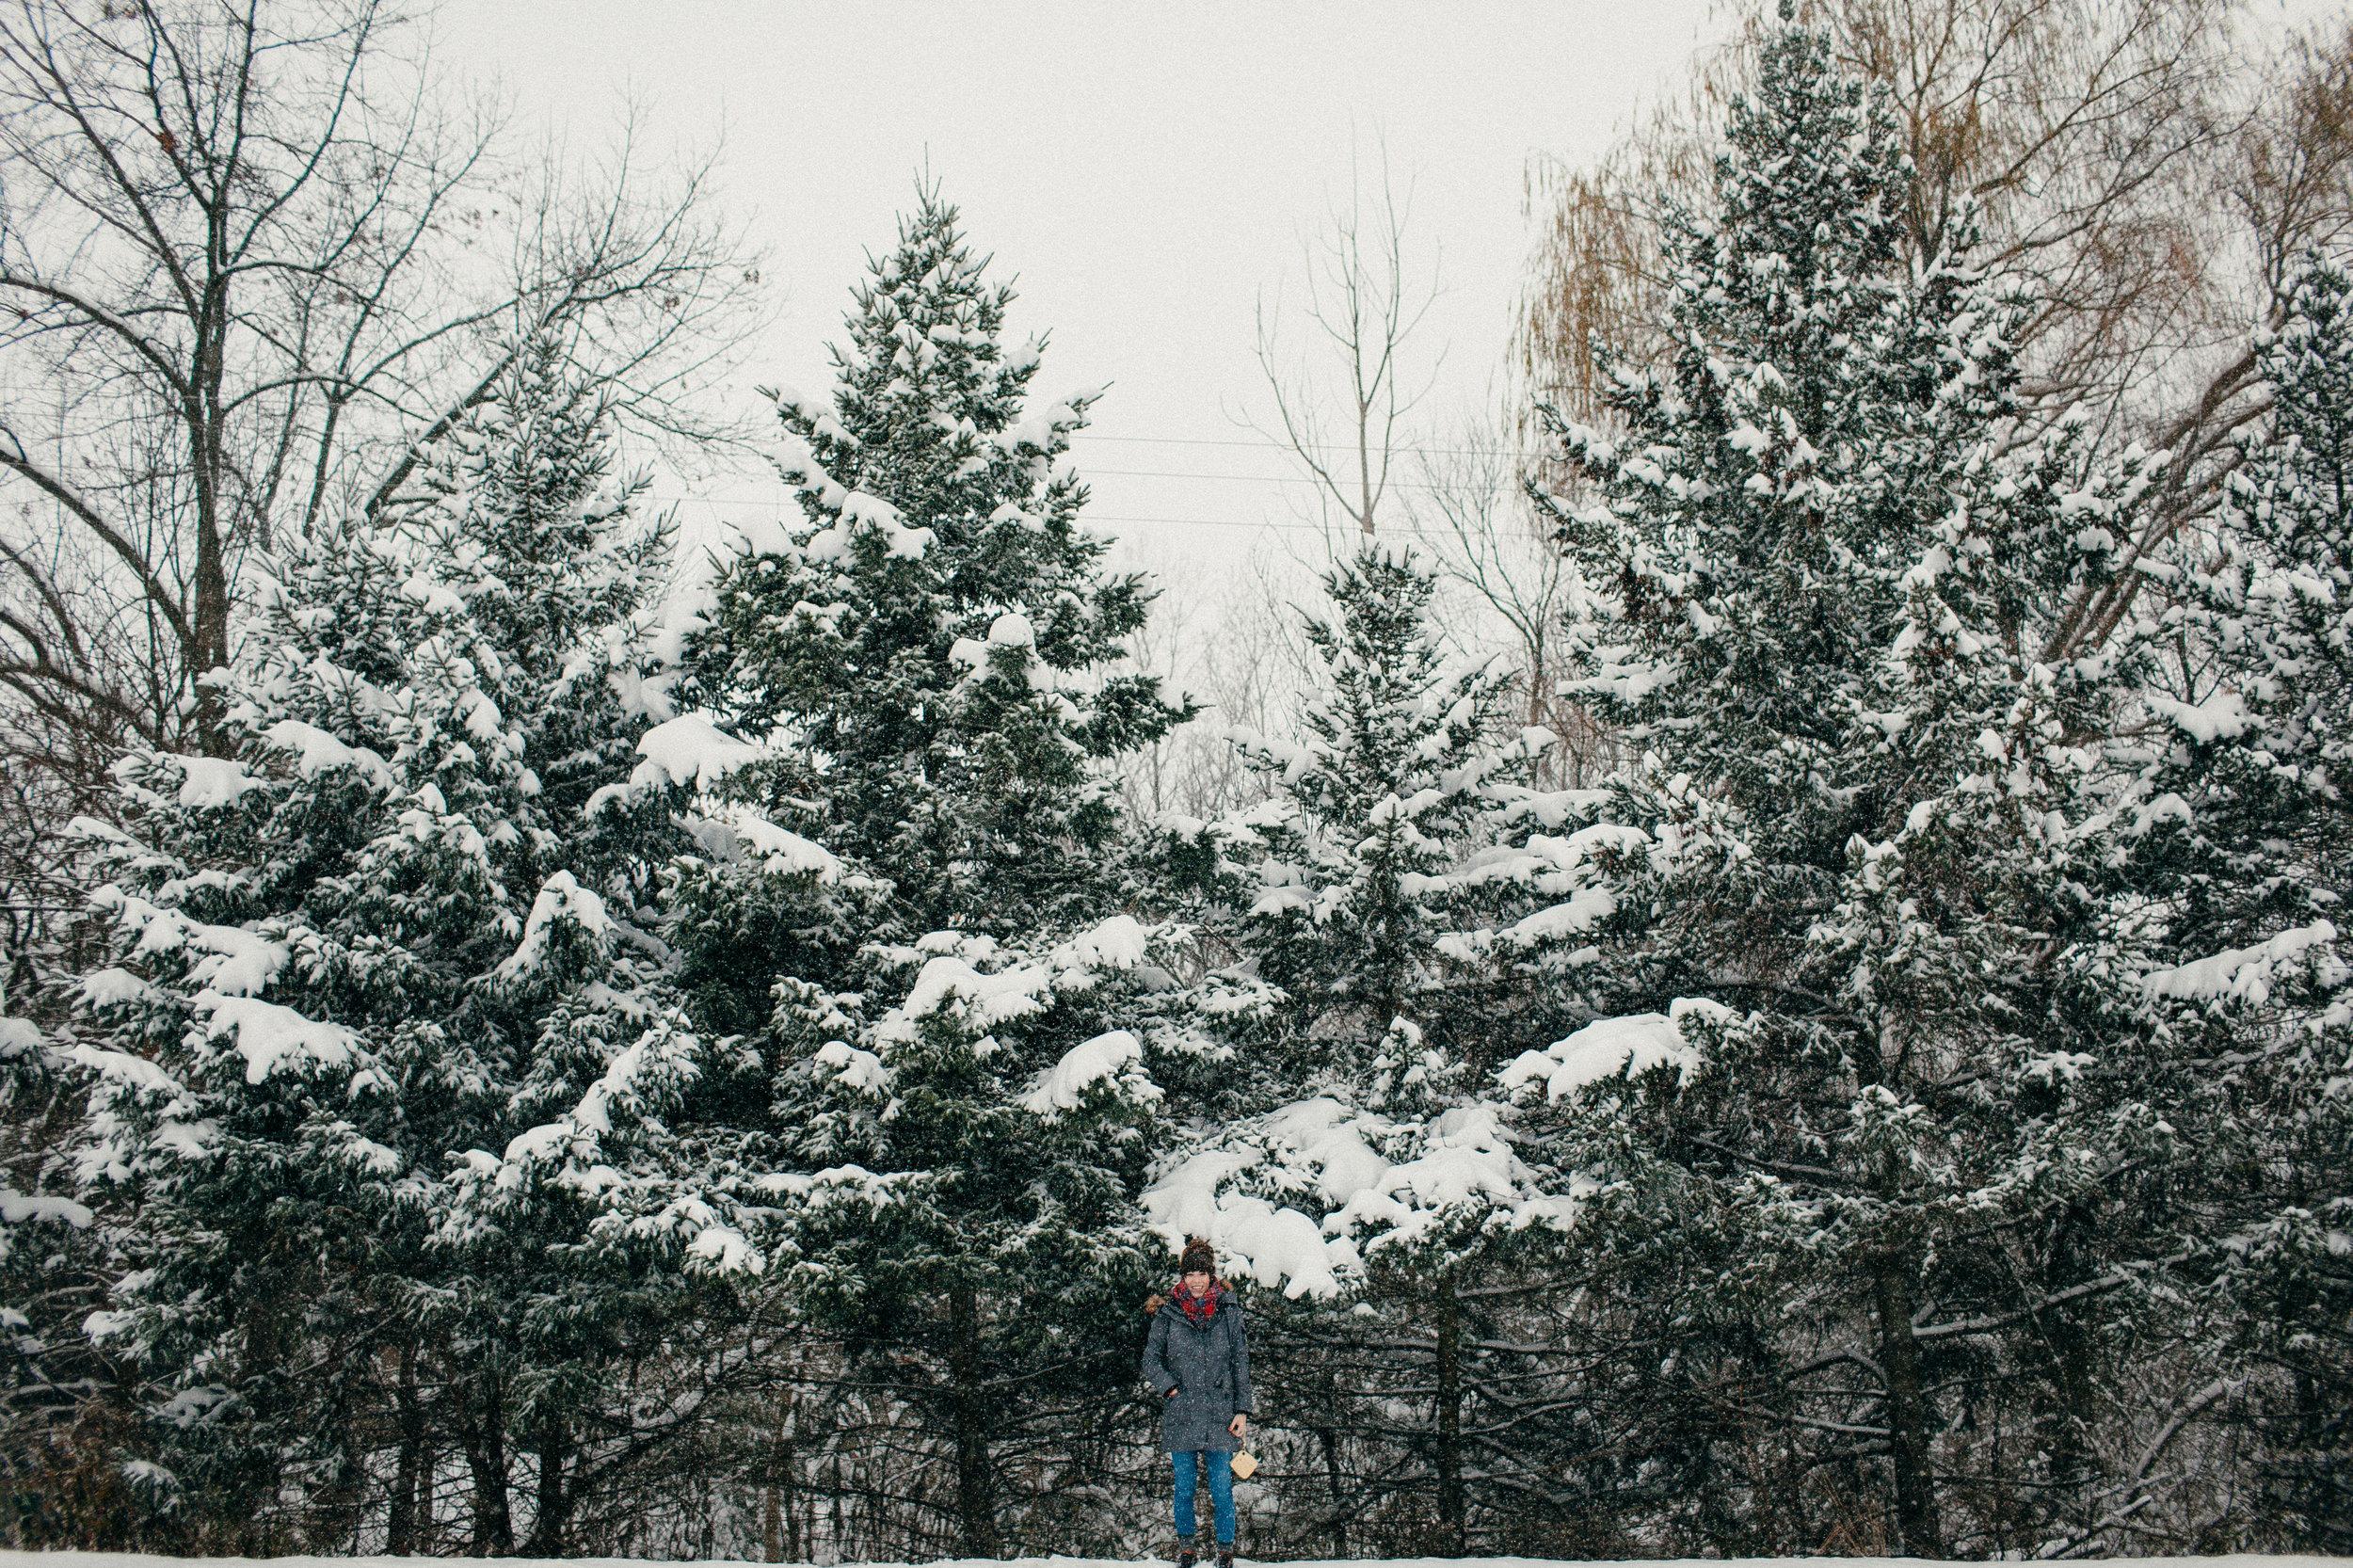 pure-michigan-winter1.JPG